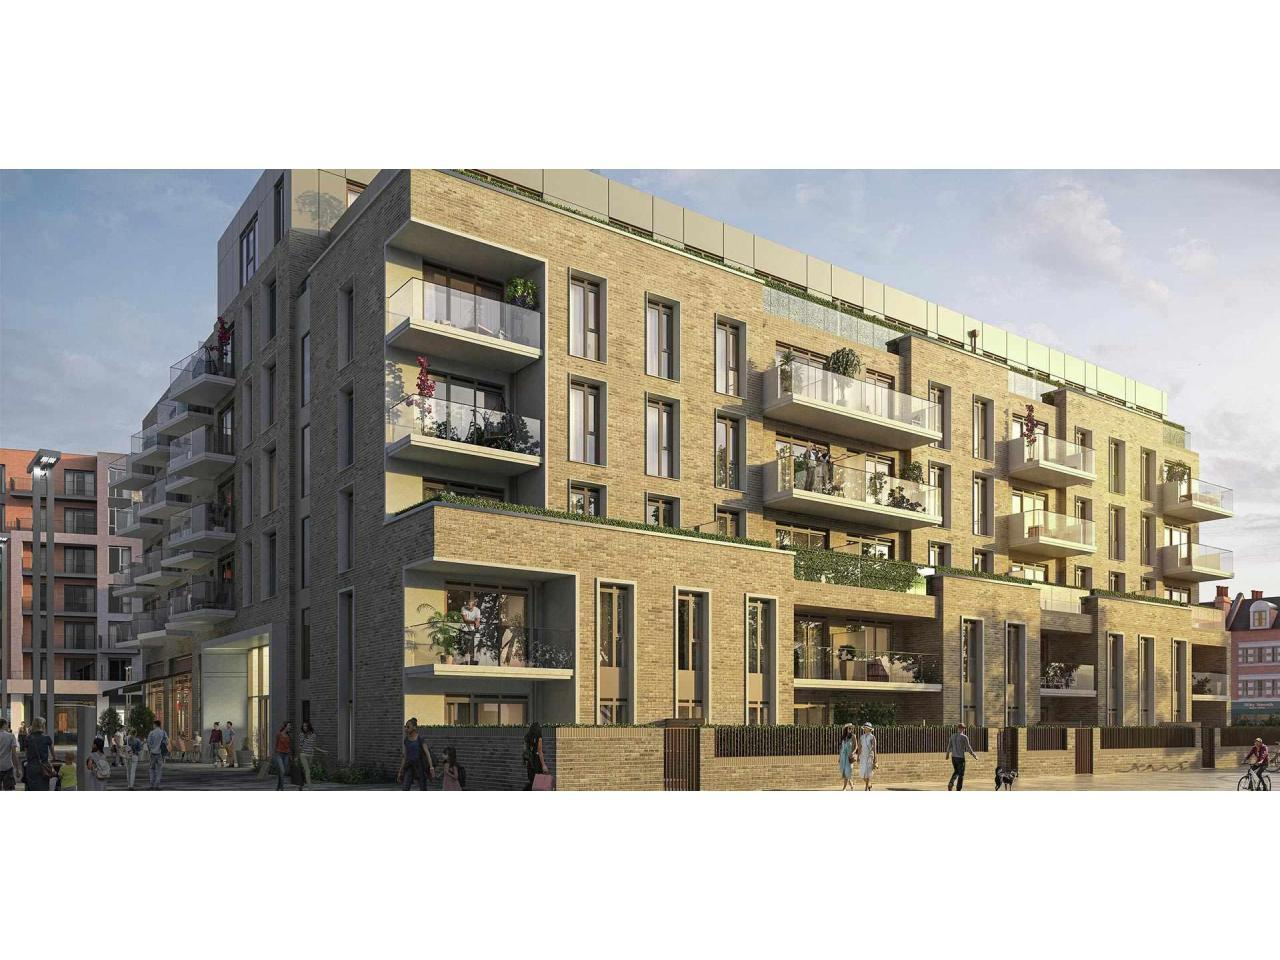 Cделки по покупке недвижимости London - 3